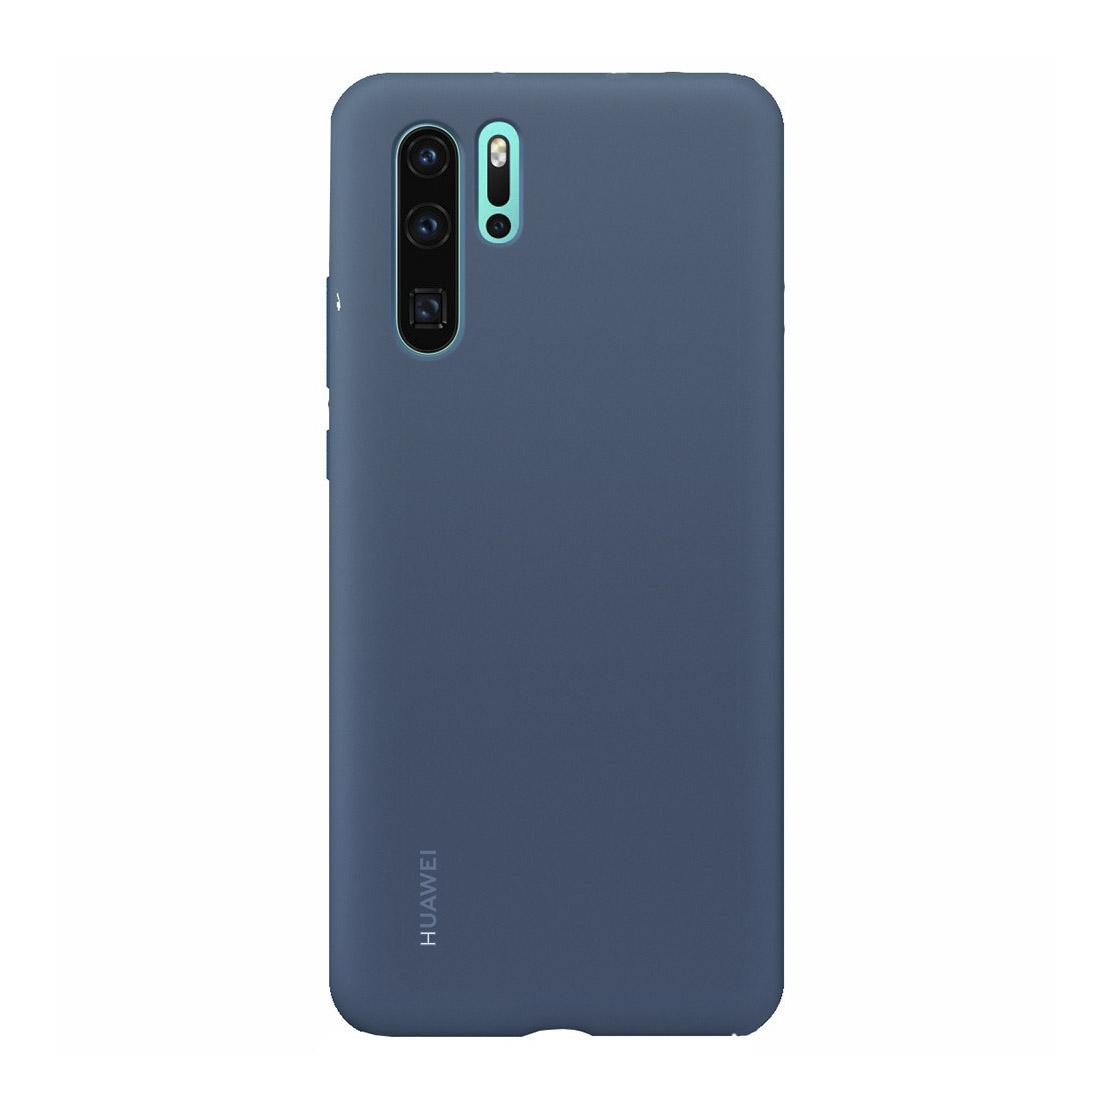 Чехол для смартфона Huawei P30 Pro Silicone Case, синий